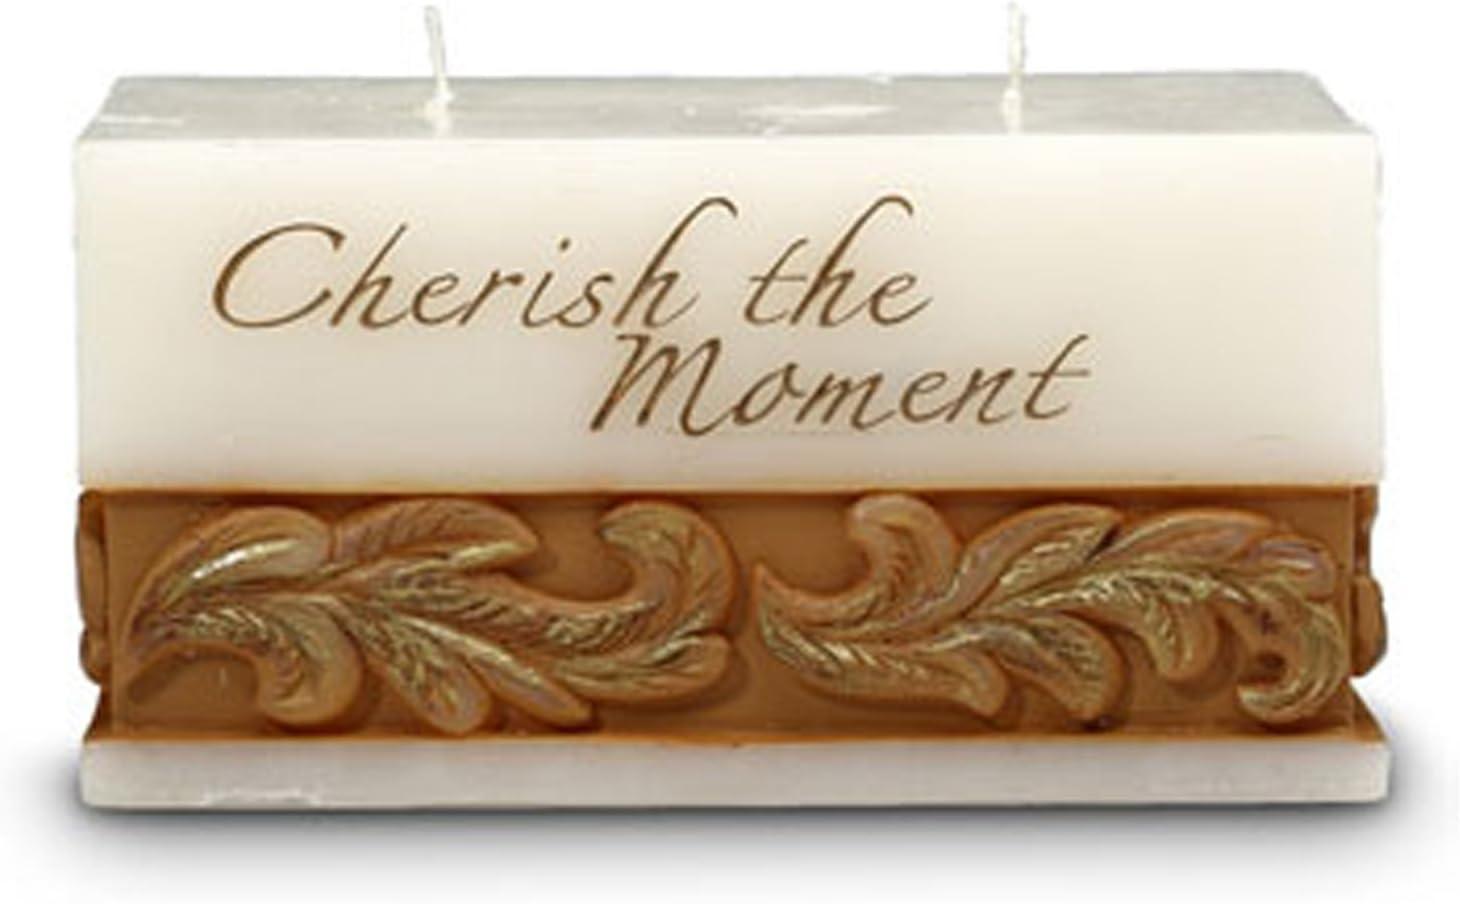 Pavilion Gift Company Cherish The Moment Candle 08533CE